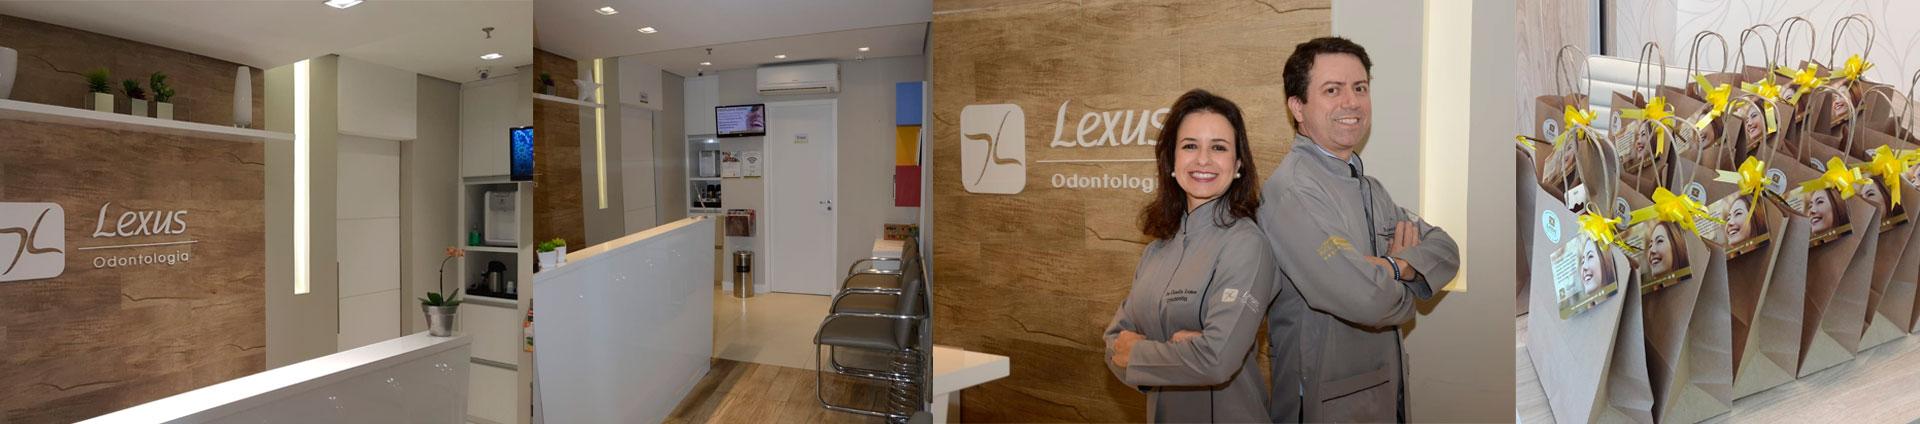 Clinica Odontológica Santana Zona Norte - Lexus Odontologia